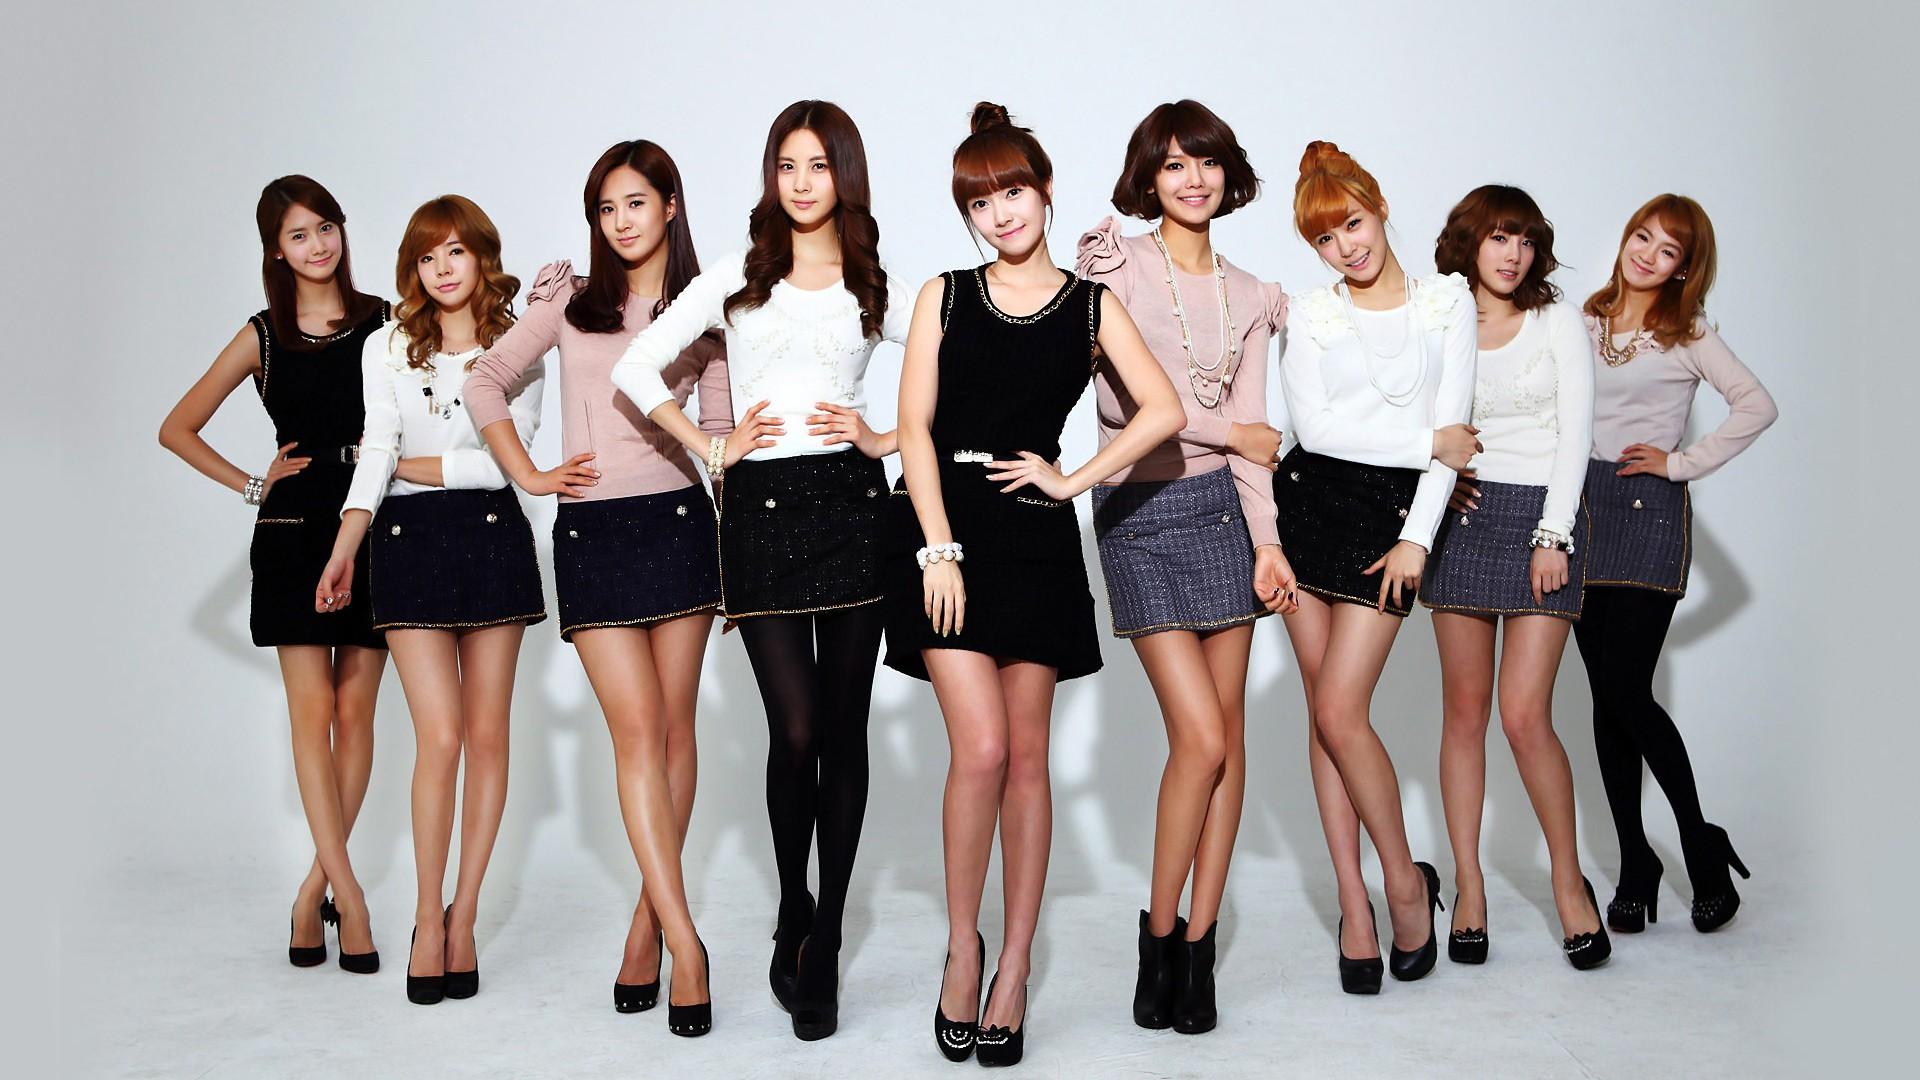 People 1920x1080 SNSD Girls' Generation Kim Taeyeon Lee Soonkyu Sunny Yoona Im Yoona Kim Hyoyeon Seohyun Tiffany Hwang Kwon Yuri Jessica Jung Choi Sooyoung women singer